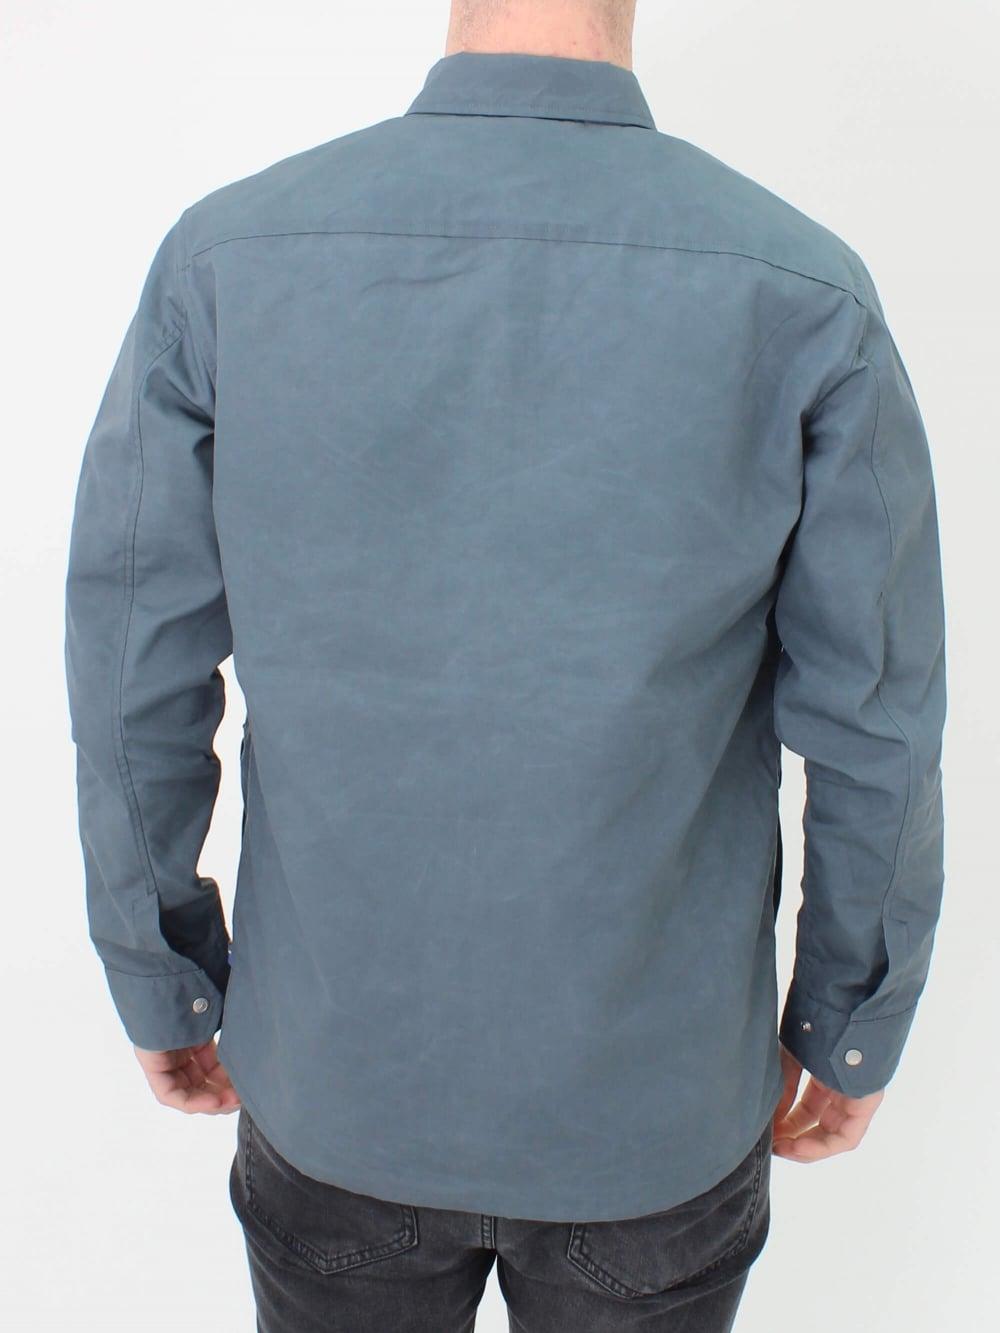 Fjallraven Greenland Zip Shirt Jacket In Dusk Northern Threads Top